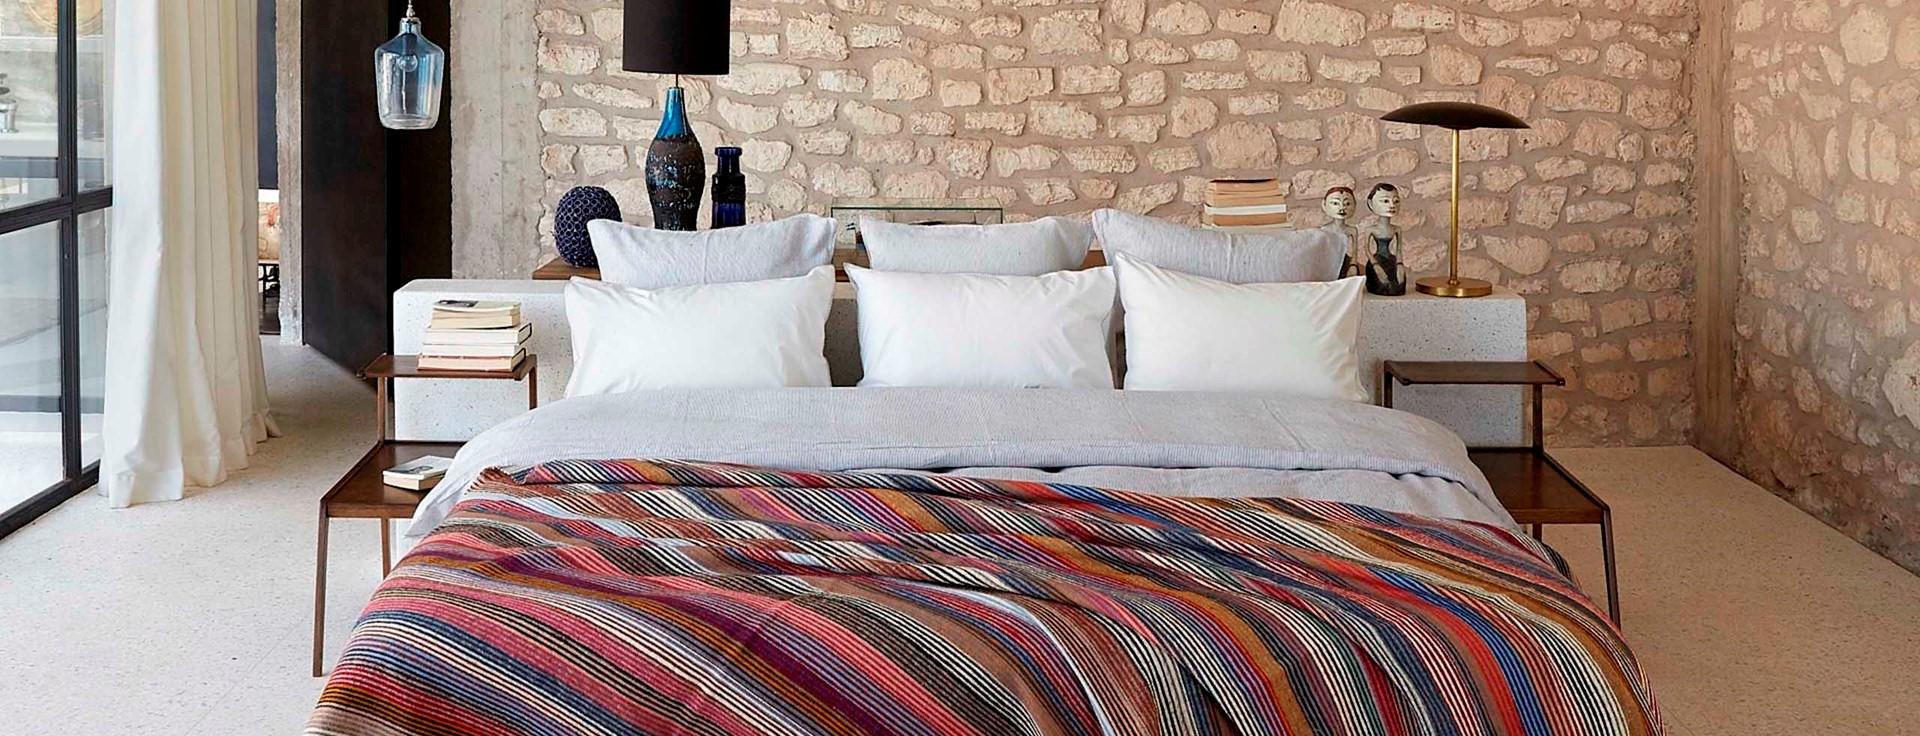 villa-mabrouka-essaouira-master-bedroom